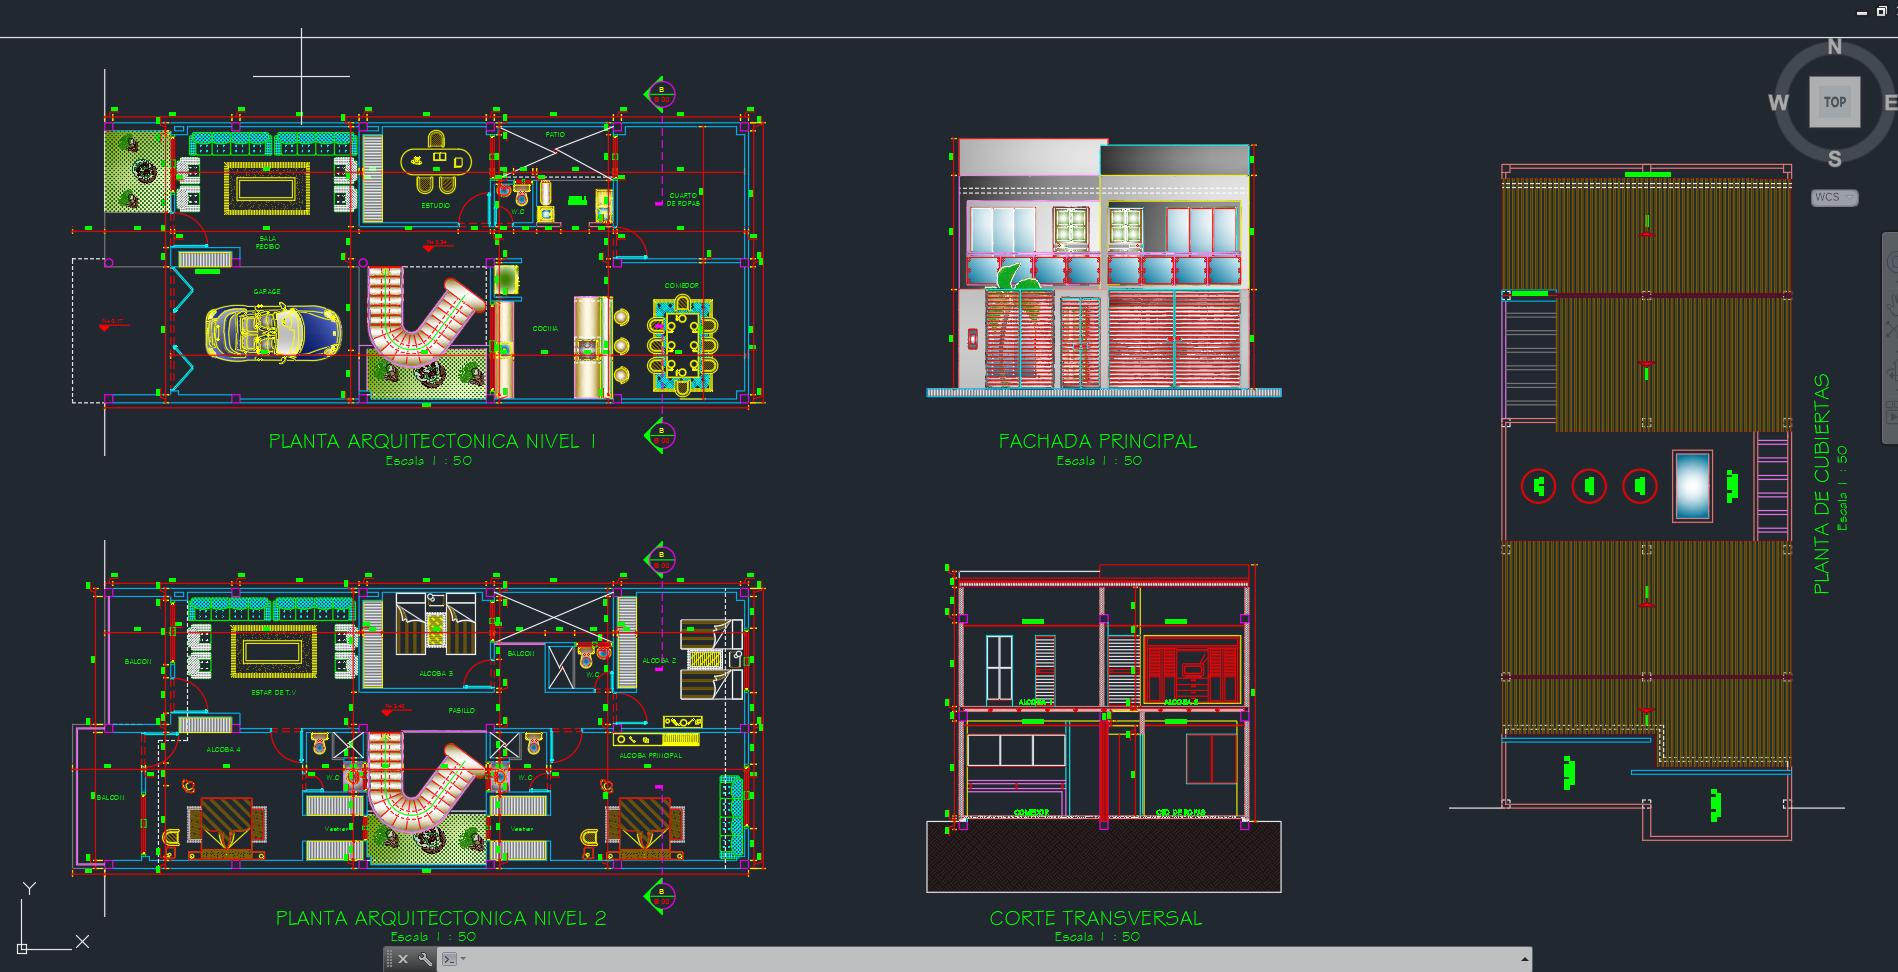 Casas de dos niveles descarga gratis de planos archivos for Que es un plano arquitectonico